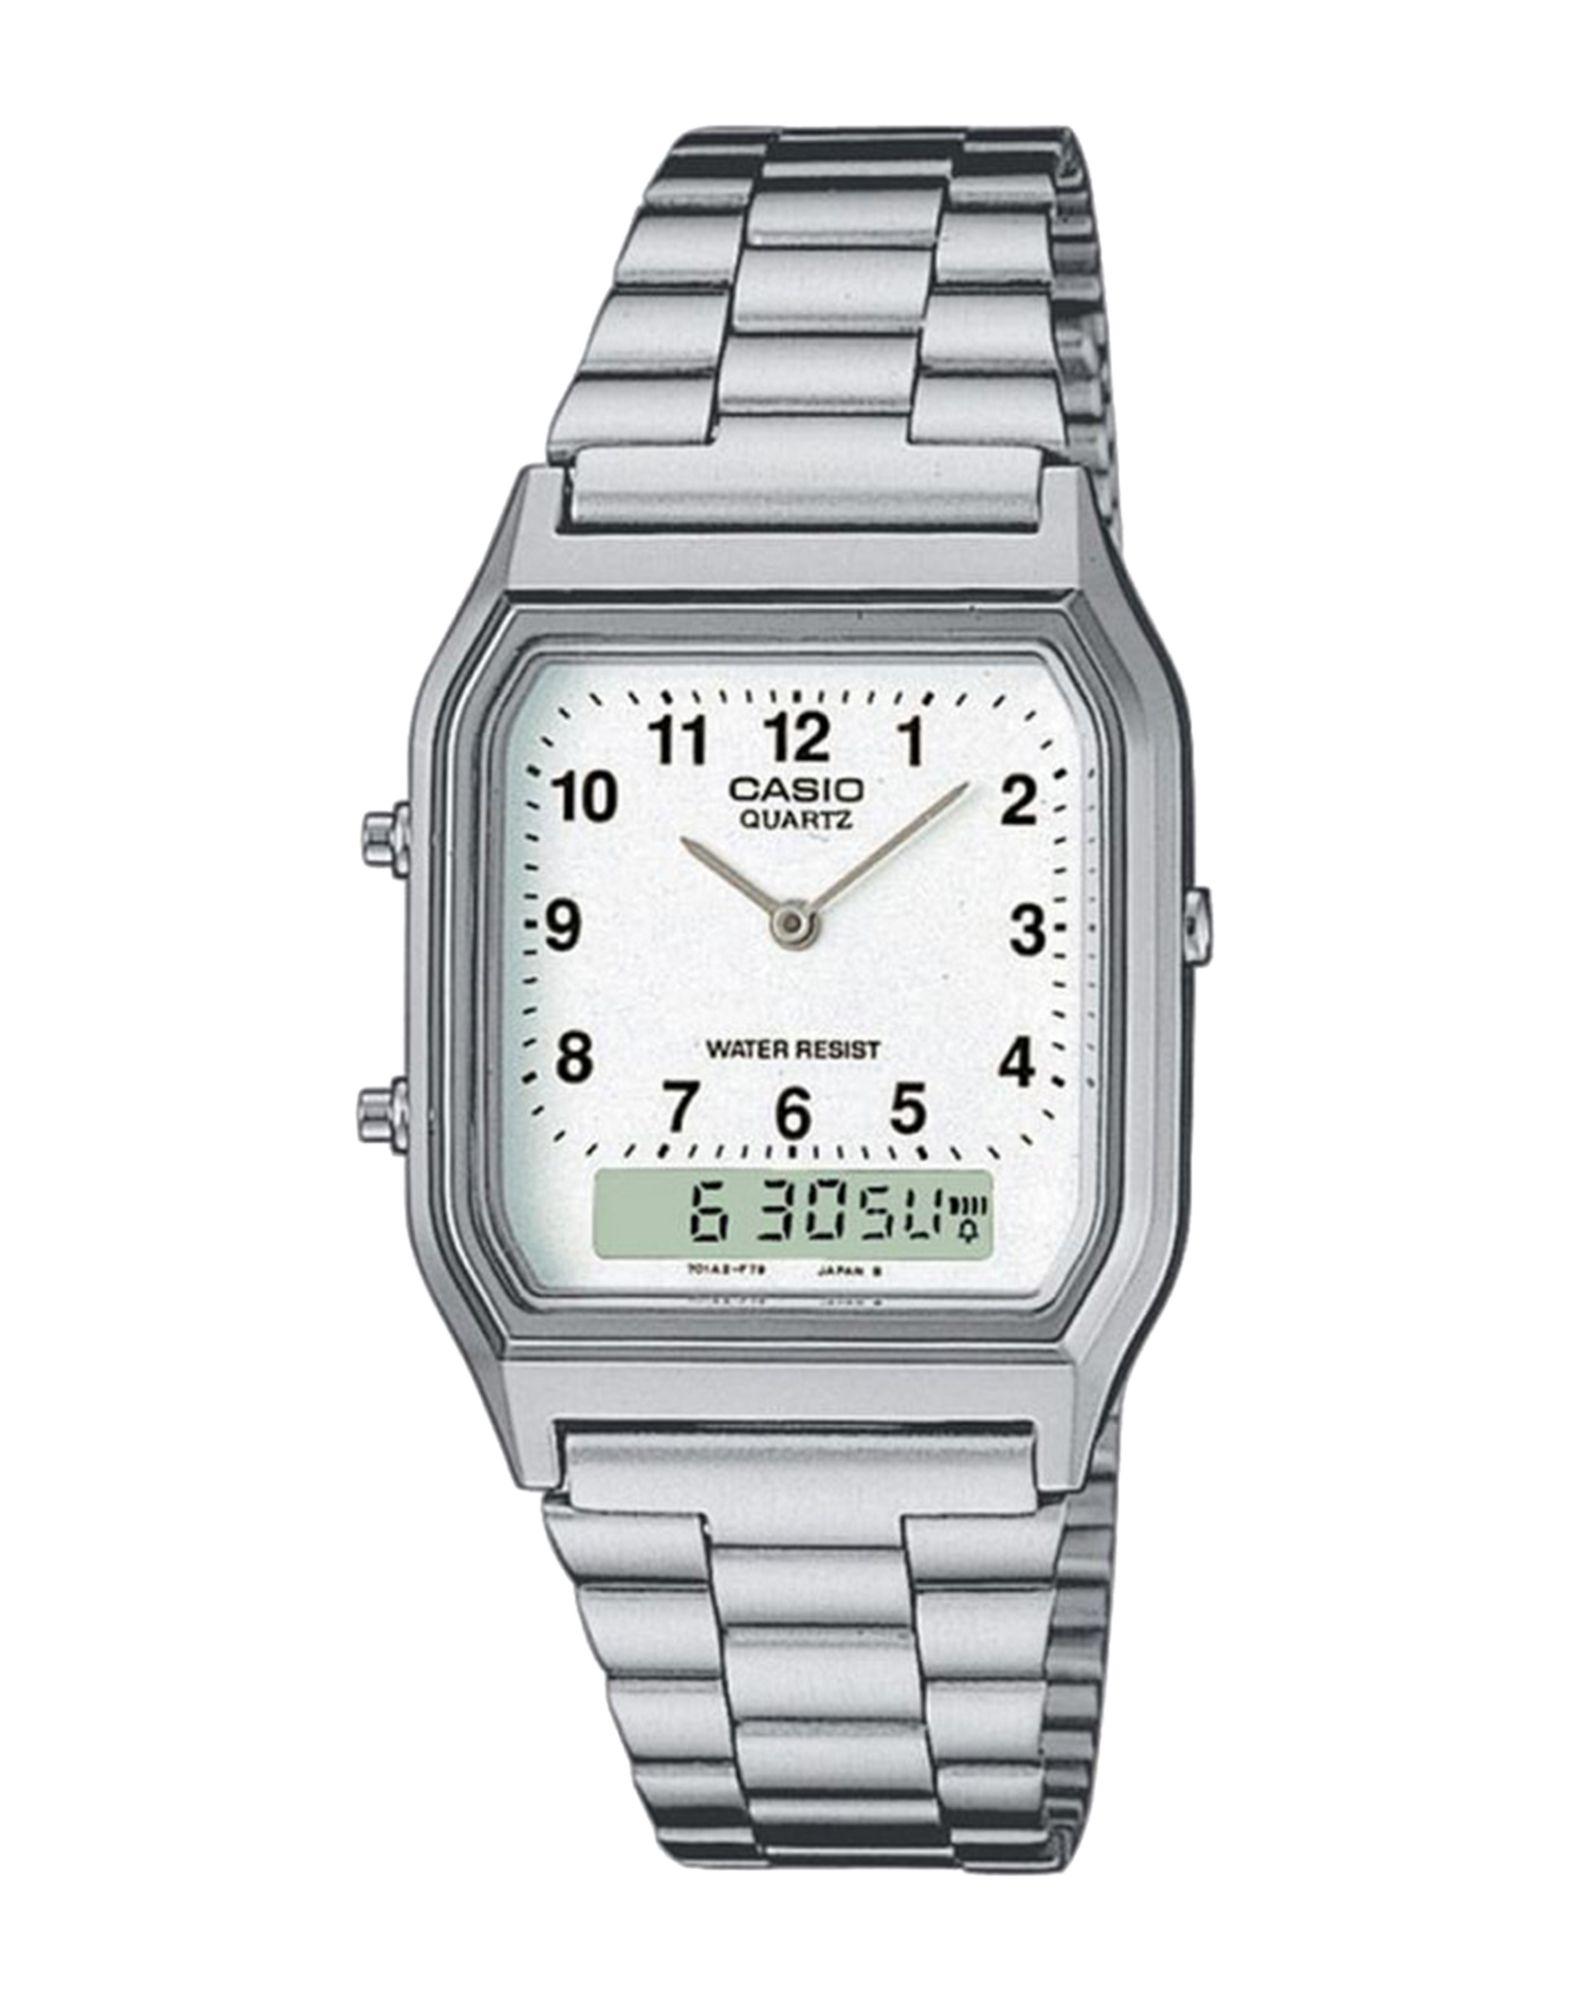 CASIO Наручные часы роскошные браслеты часы часы часы часы кварца часы vintage турецкие наручные часы индийский свадебный подарок антикварных ювелирны